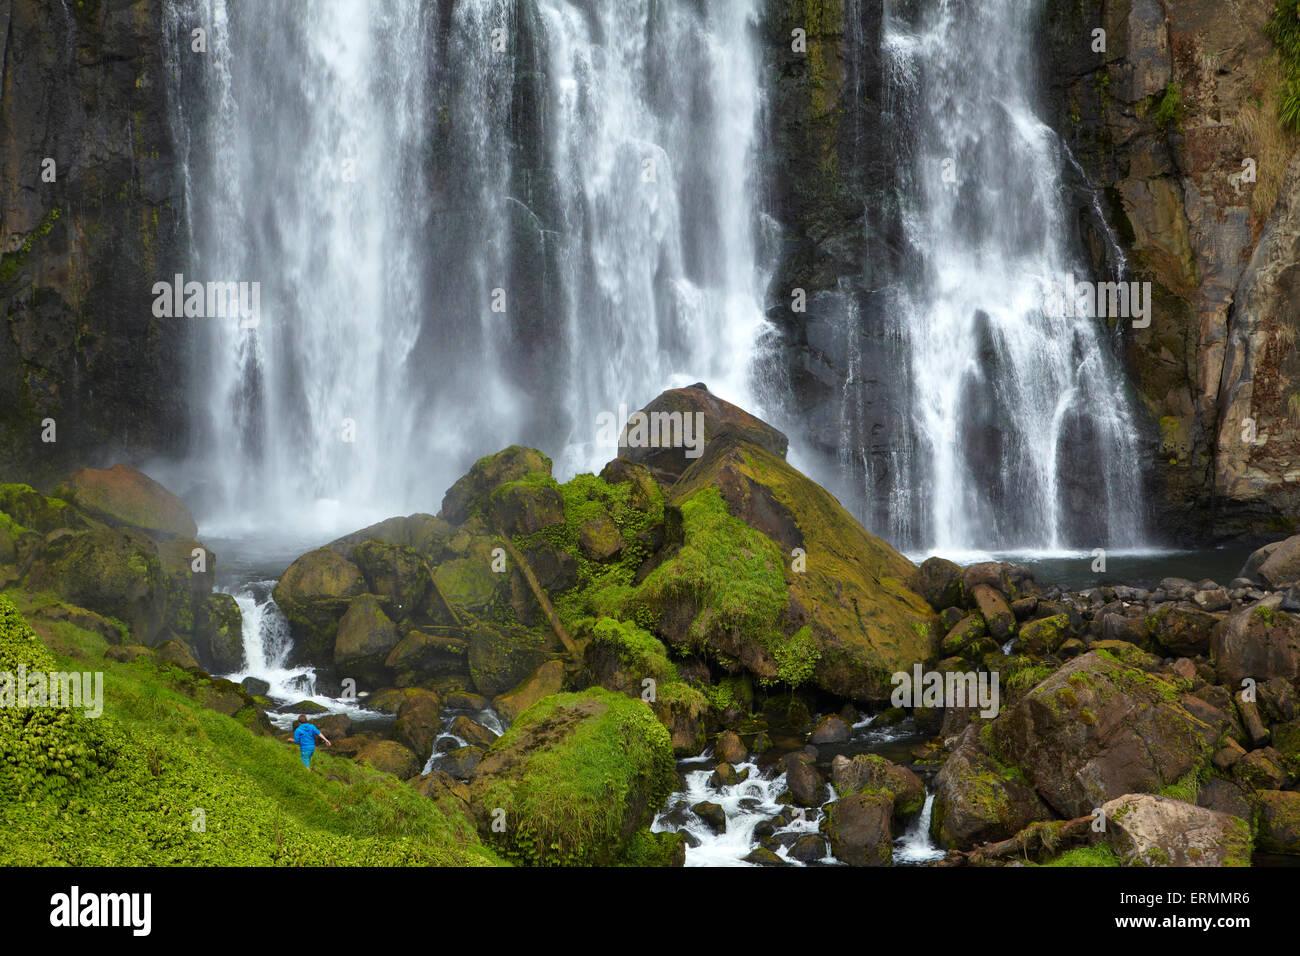 Marokopa Falls, Waitomo District, Waikato, North Island, New Zealand - Stock Image